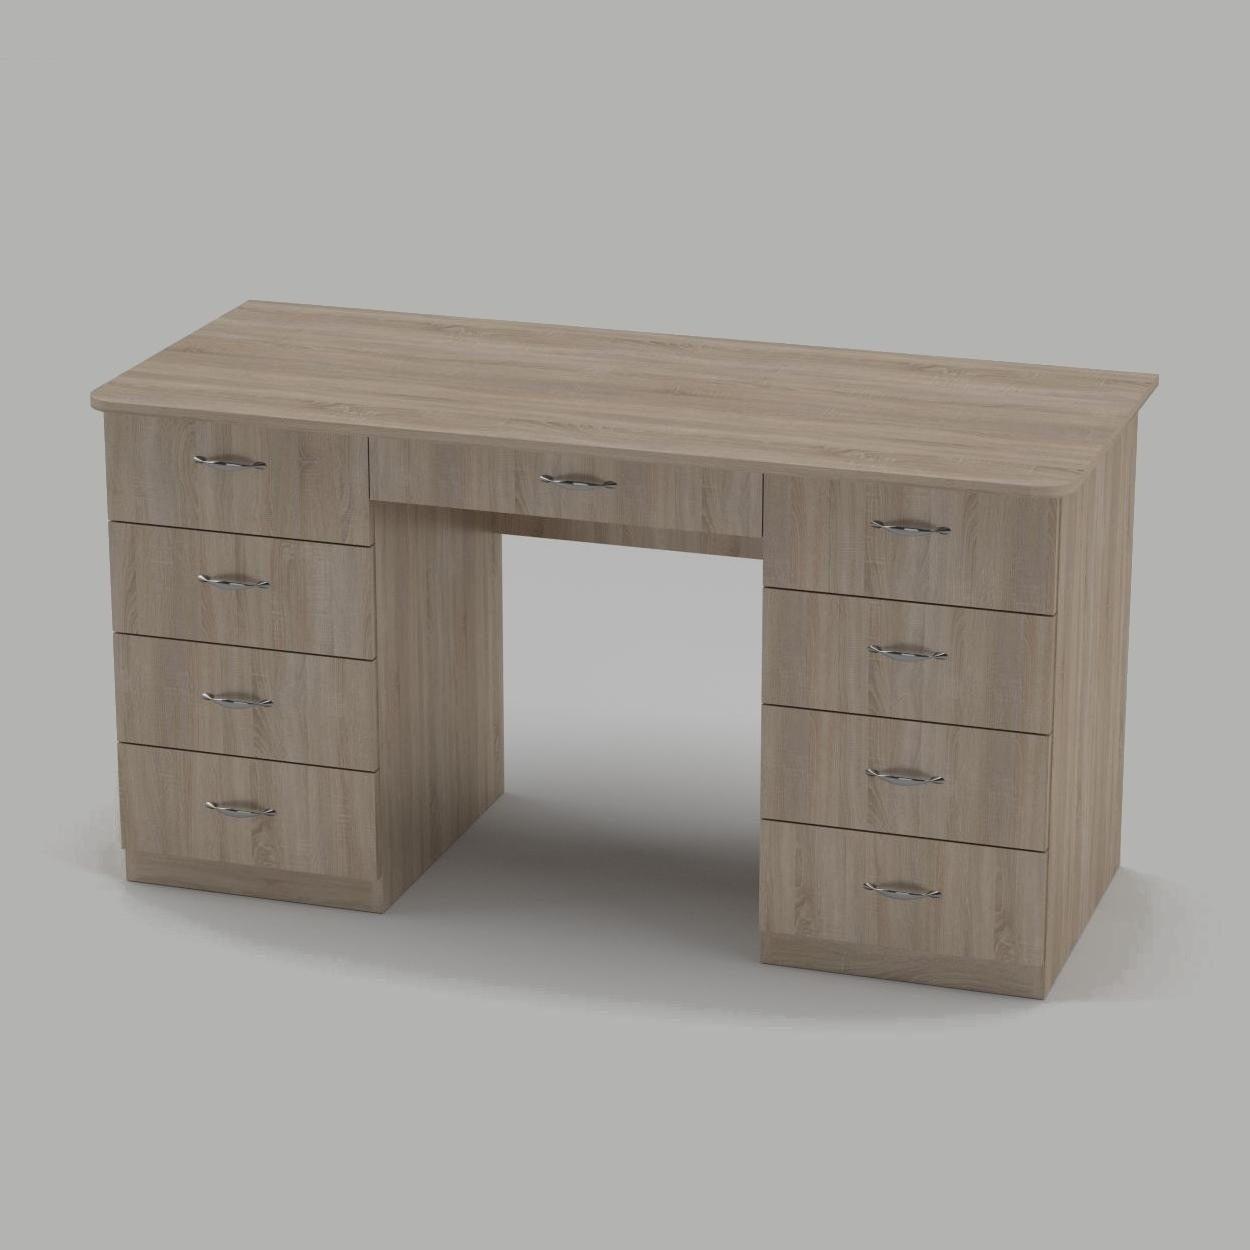 Письменный стол Компанит Учитель-3 1400х600х736 мм дуб сонома